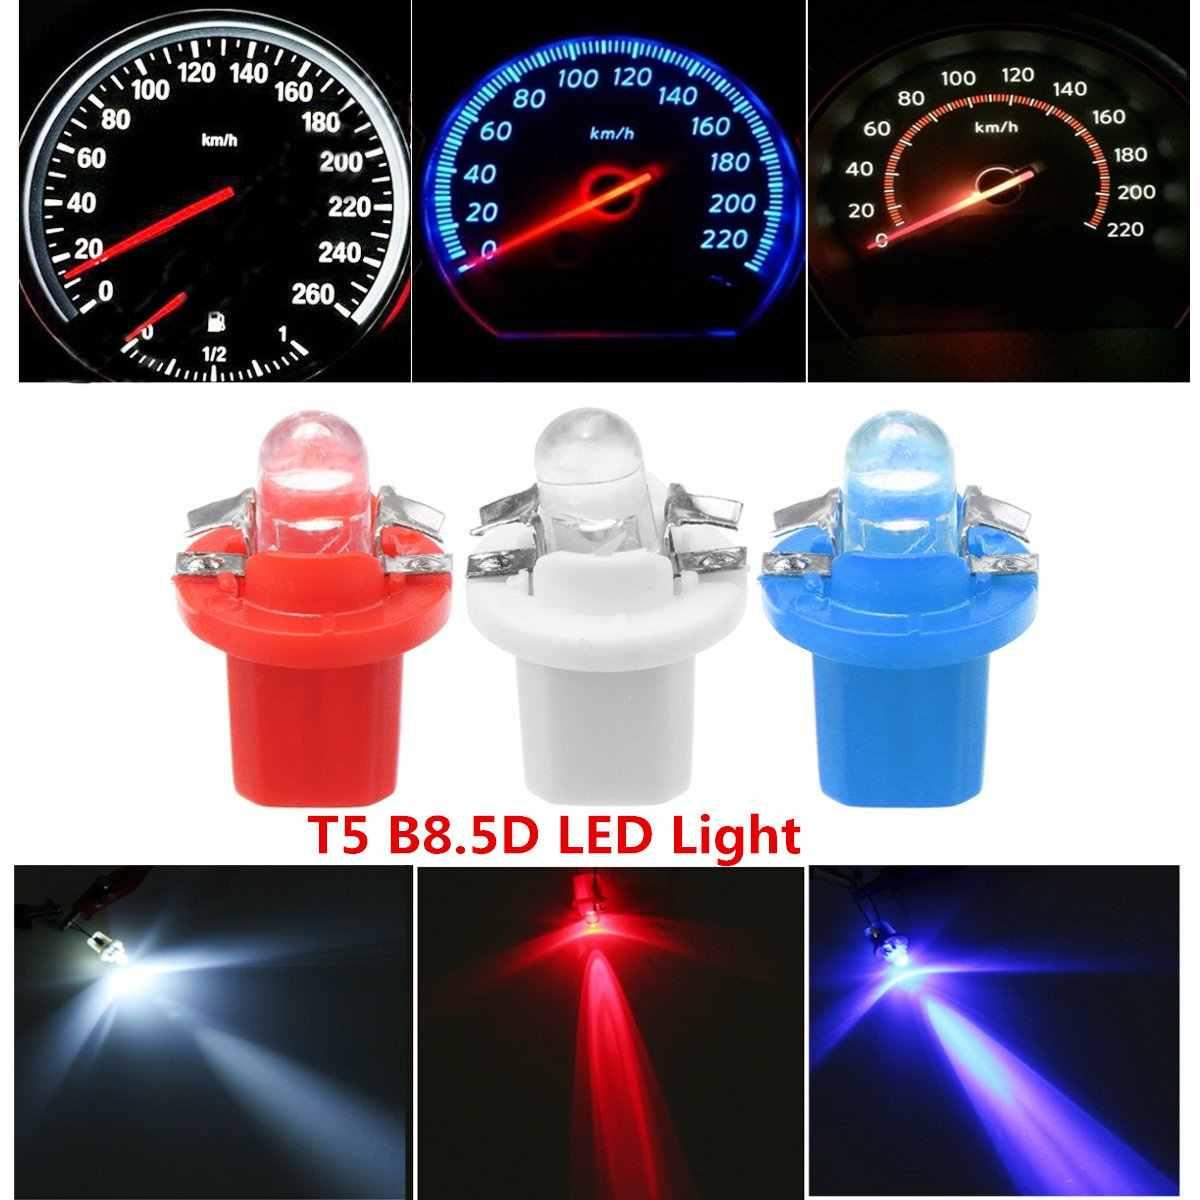 12v B8.5D TACHO 1 LED Super Bright Bulb Red New